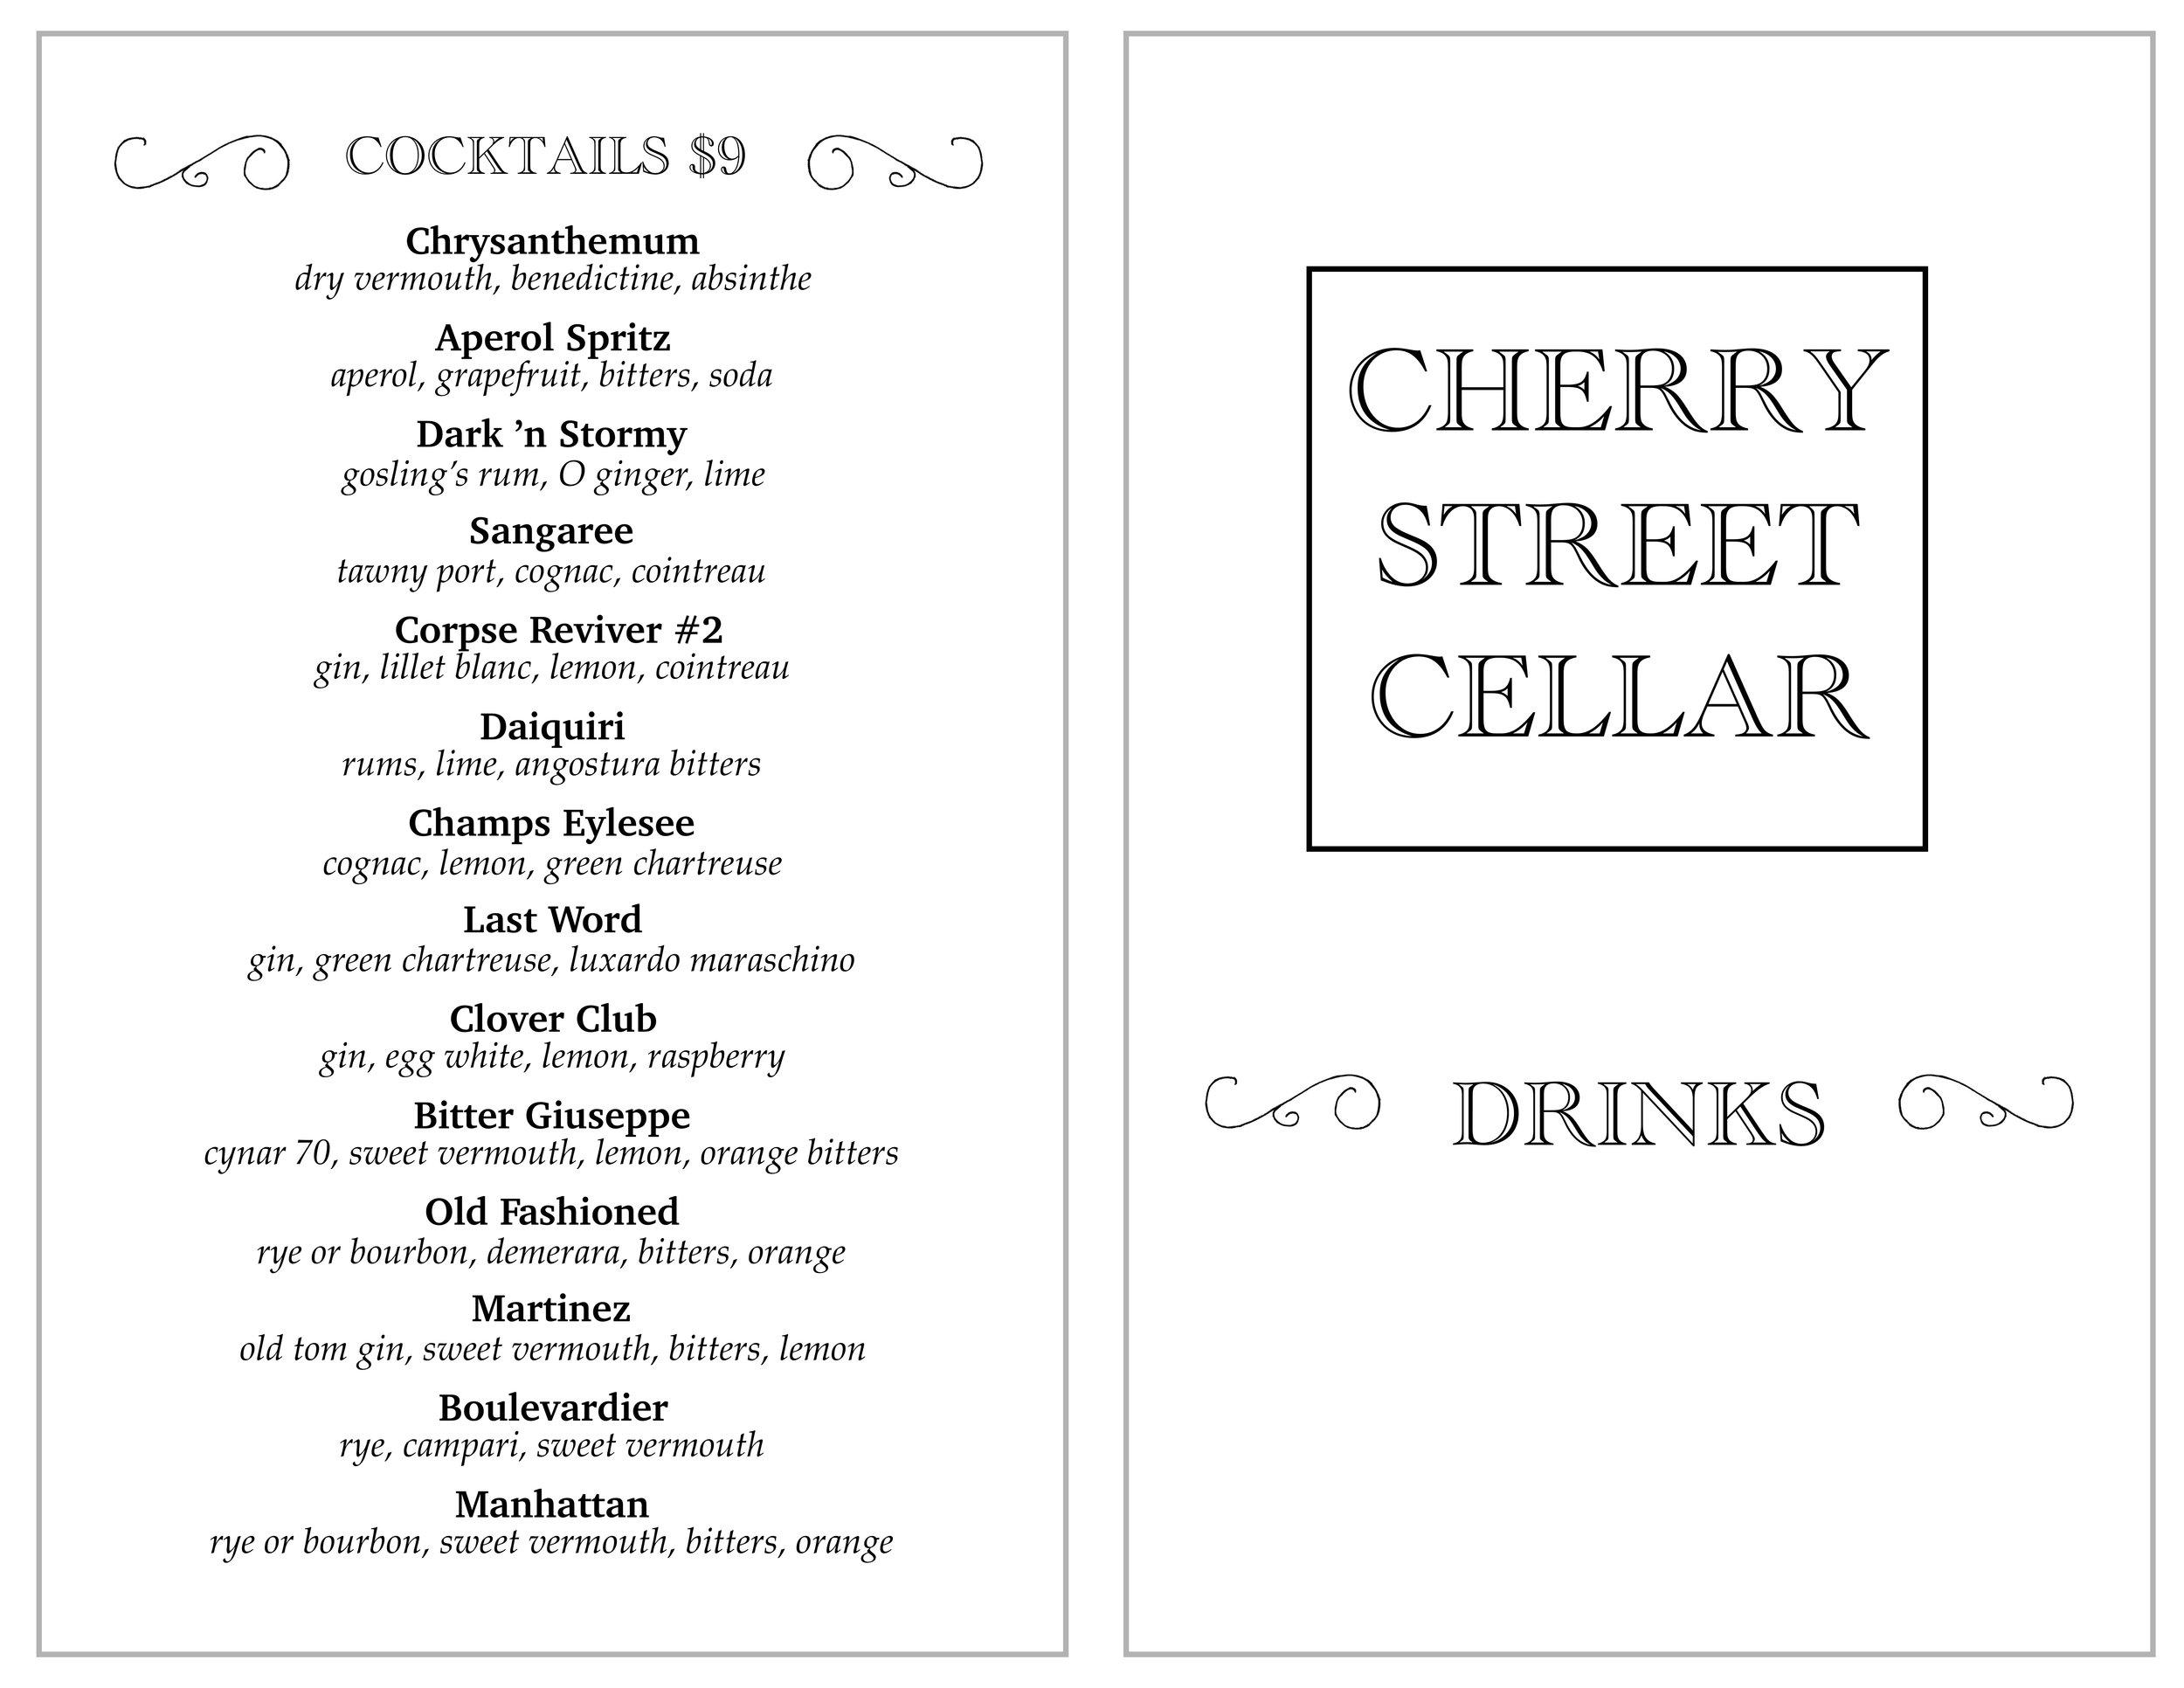 Cherry Street Cellar Drink Menu website copy 2.jpg